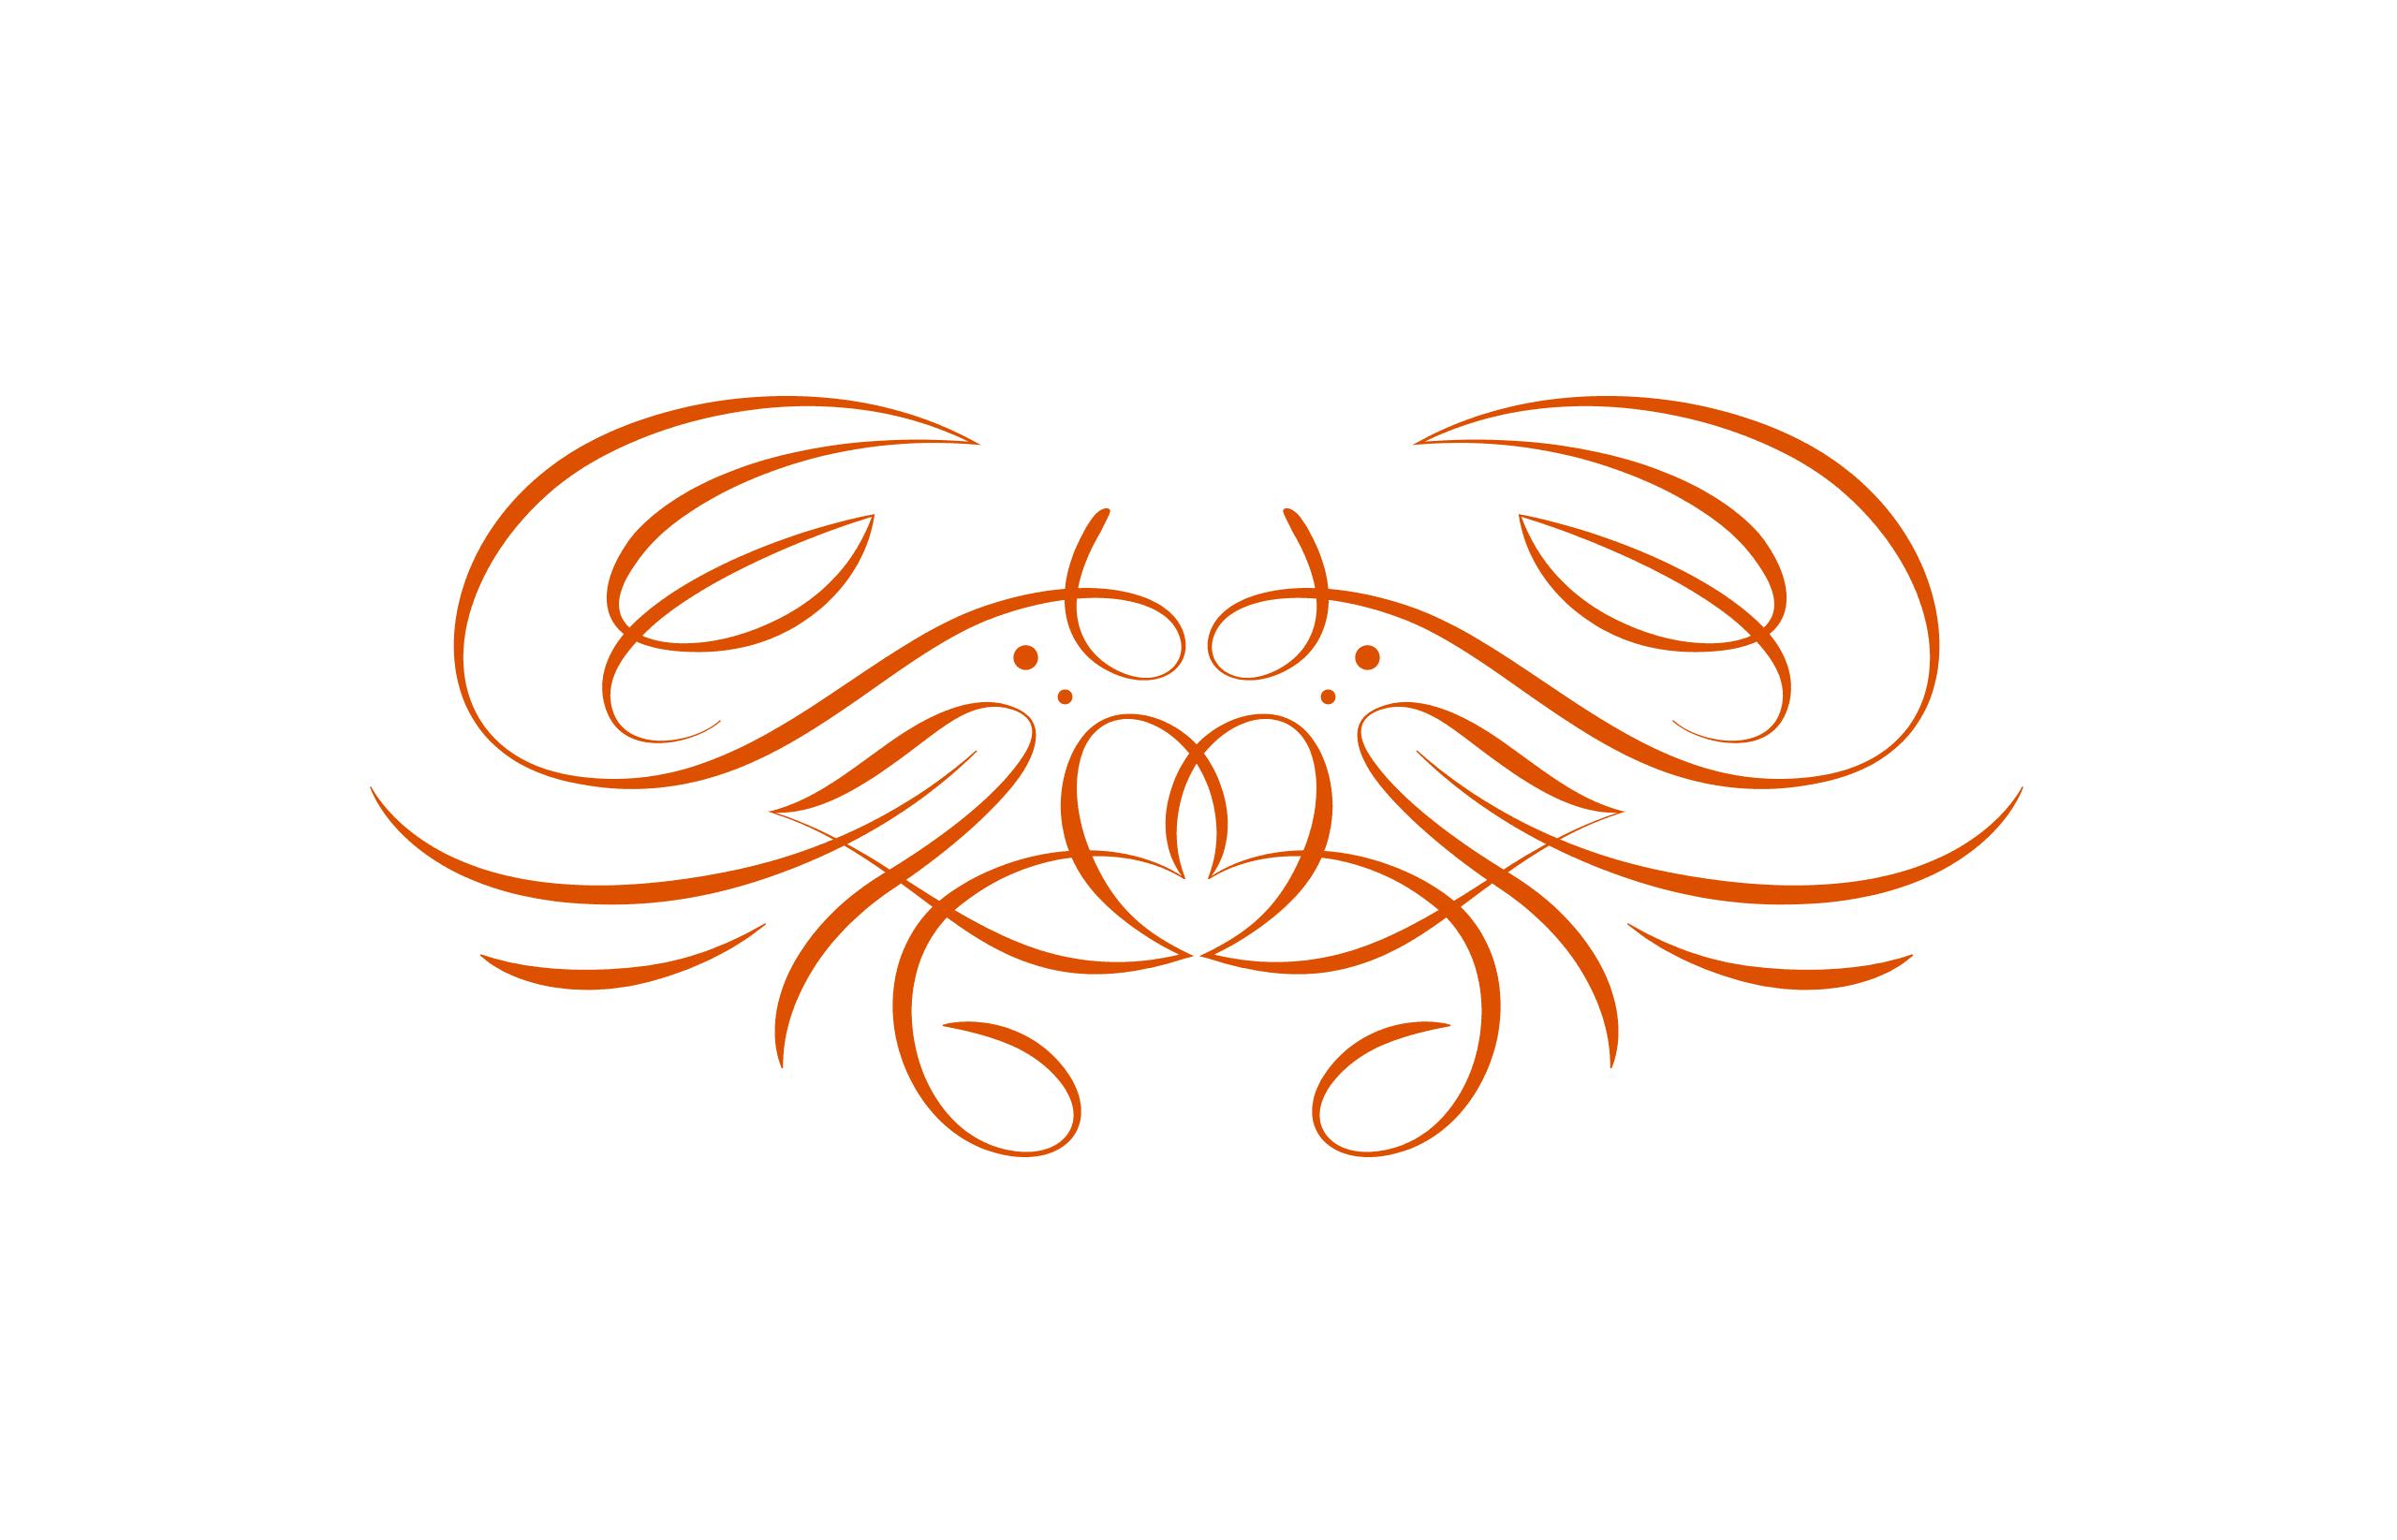 Callinectes Logo designed by Dan Forster